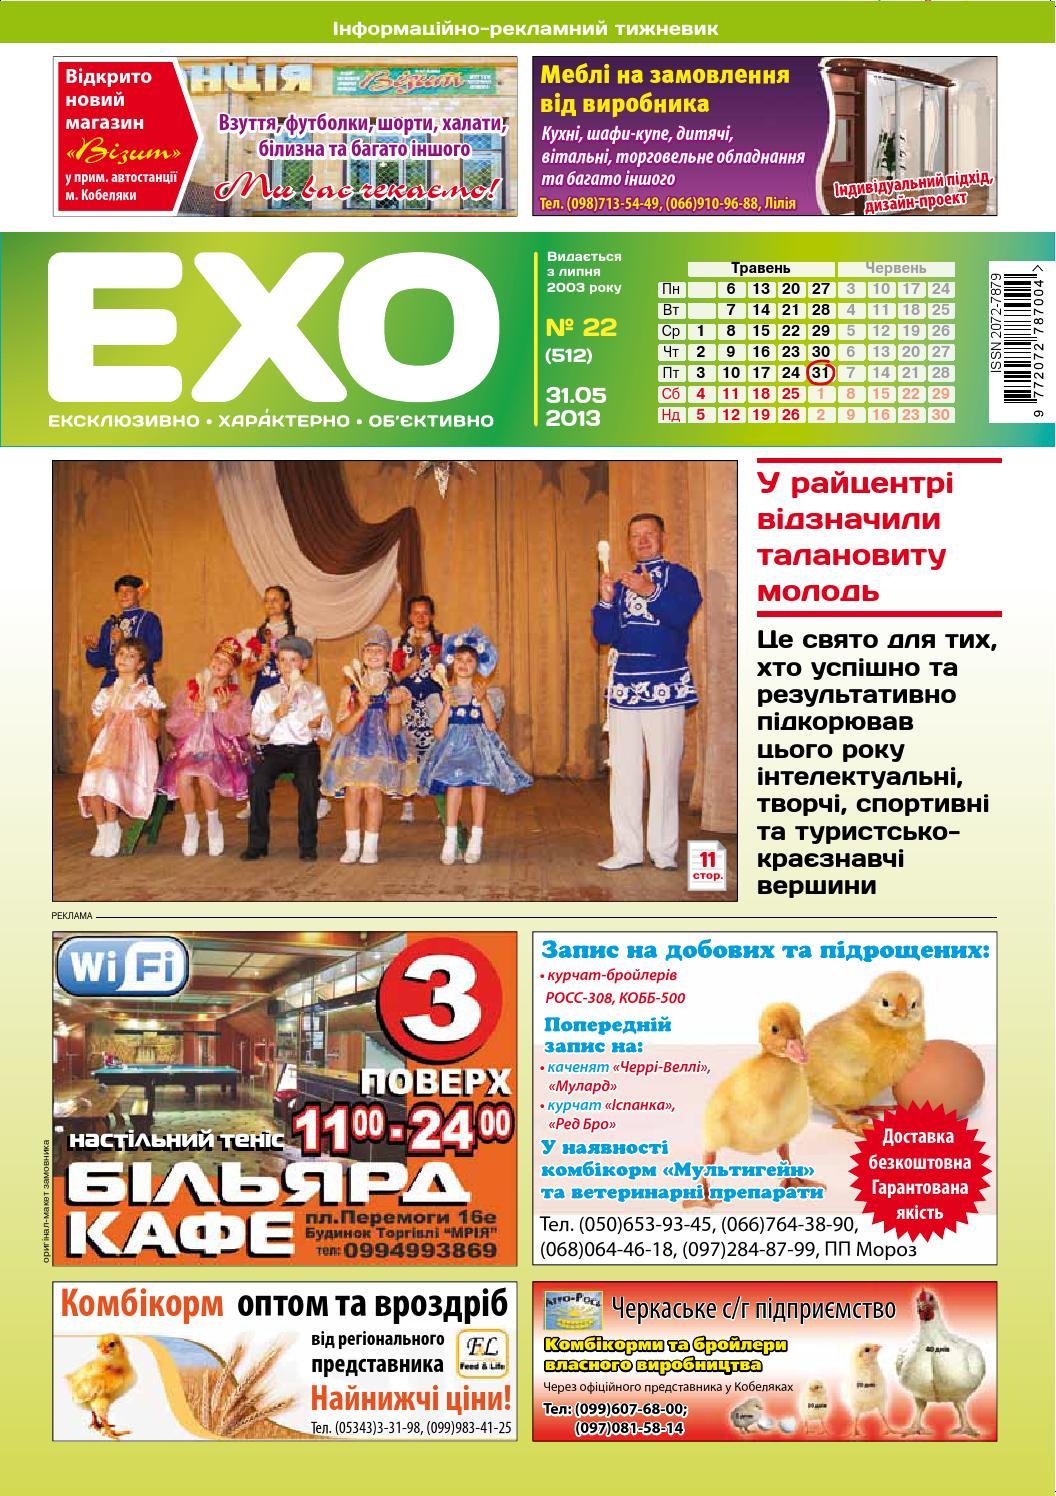 Exo 22 512 kob by Тижневик «ЕХО» - issuu c139e5cac284f